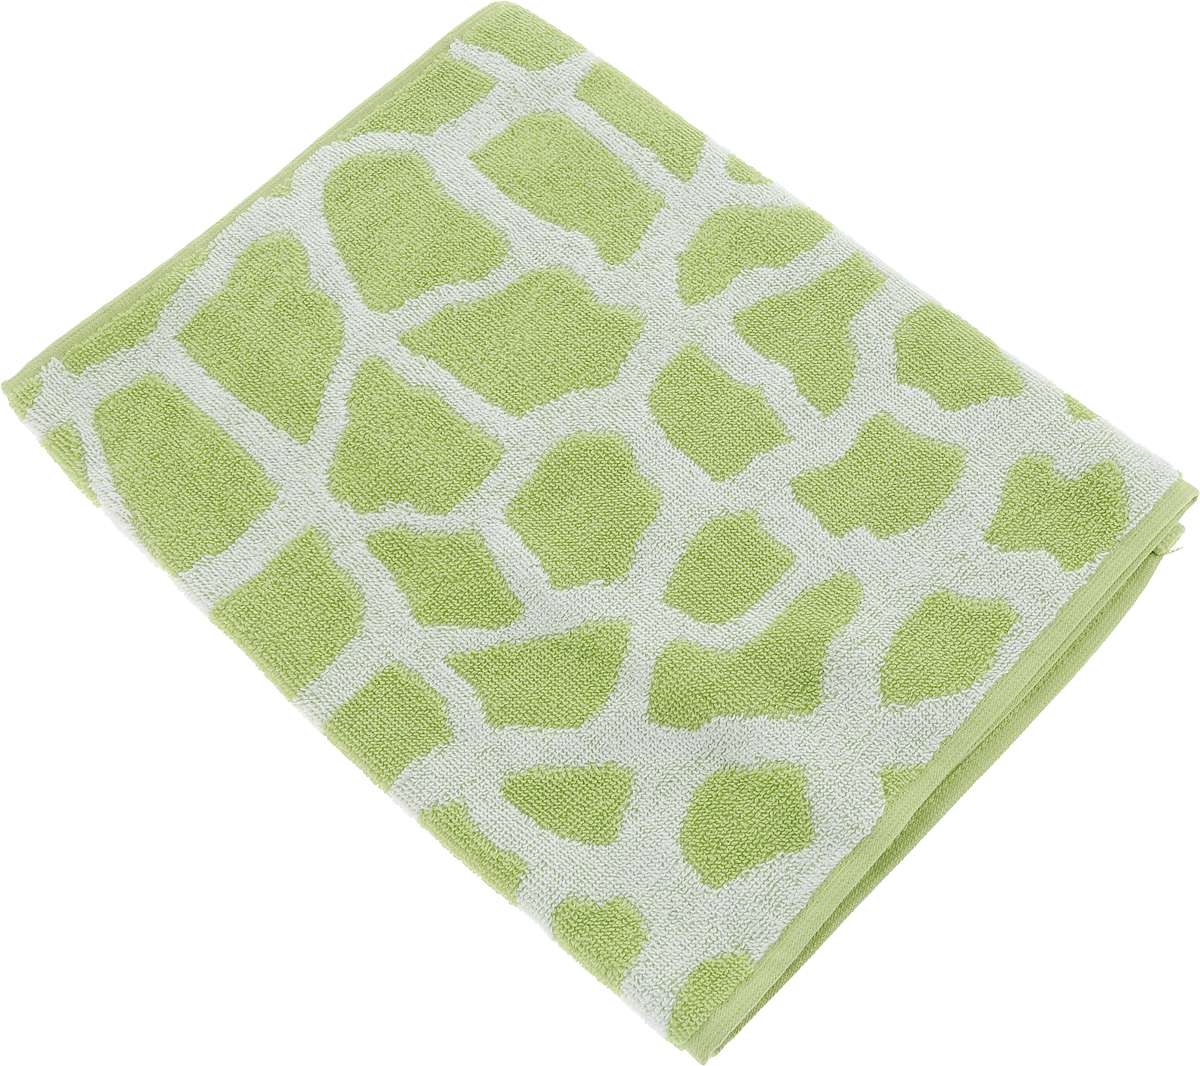 Полотенце банное Aquarelle Мадагаскар. Жираф, цвет: белый, травяной, 35 х 70 см. 713160713160Полотенце банное AQUARELLE, размер 35х70см, серия-Мадагаскар жираф, белый, травяной